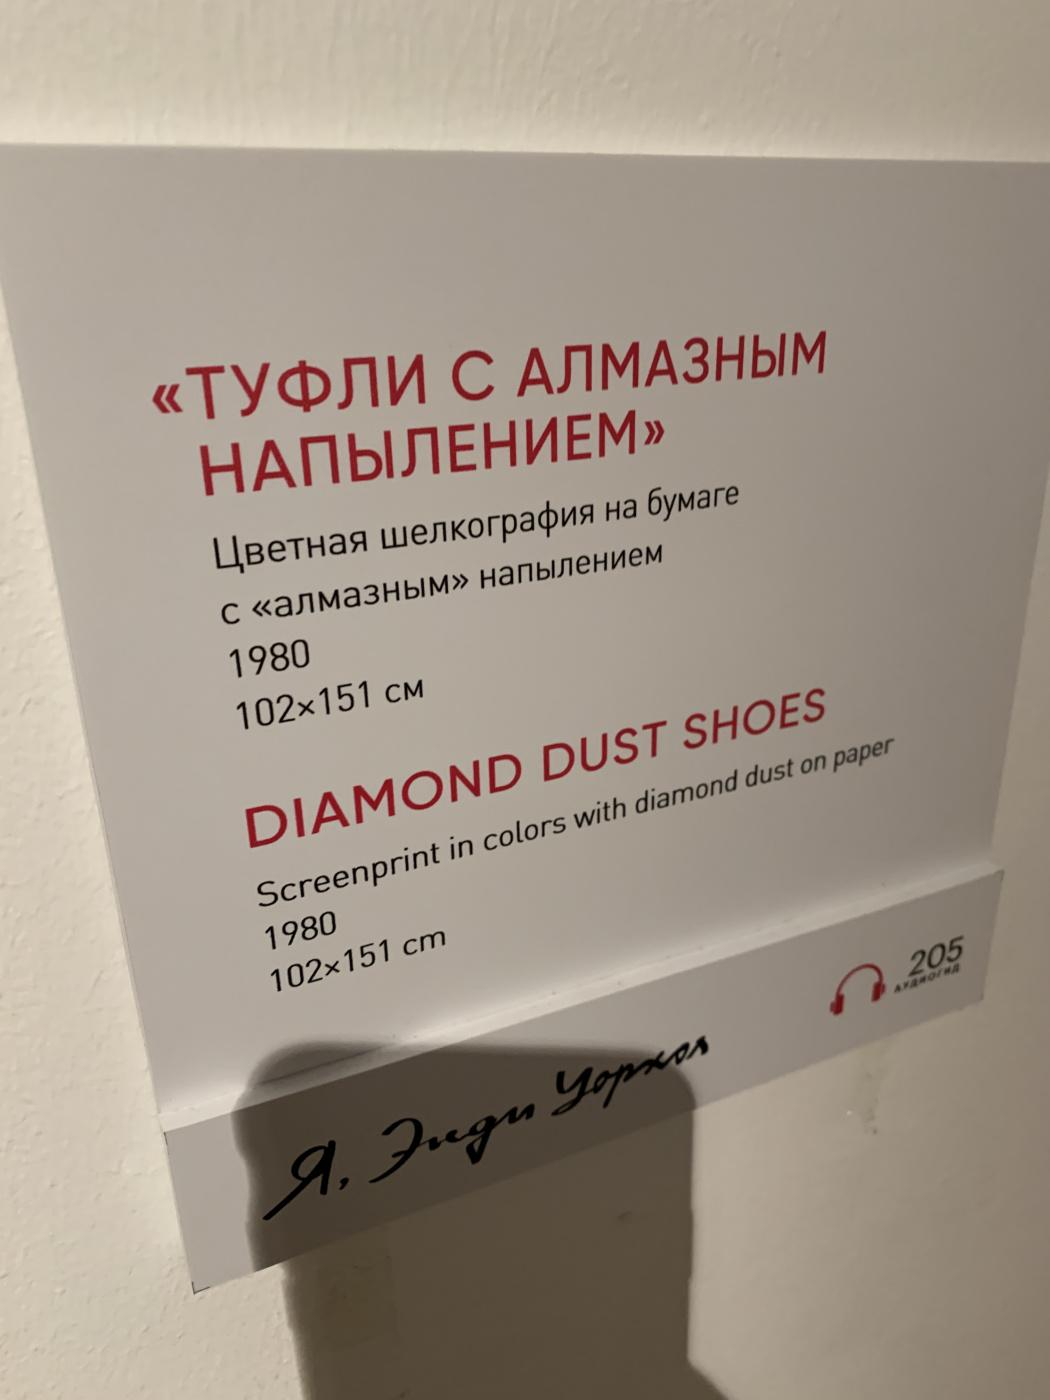 Diamond-coated shoes